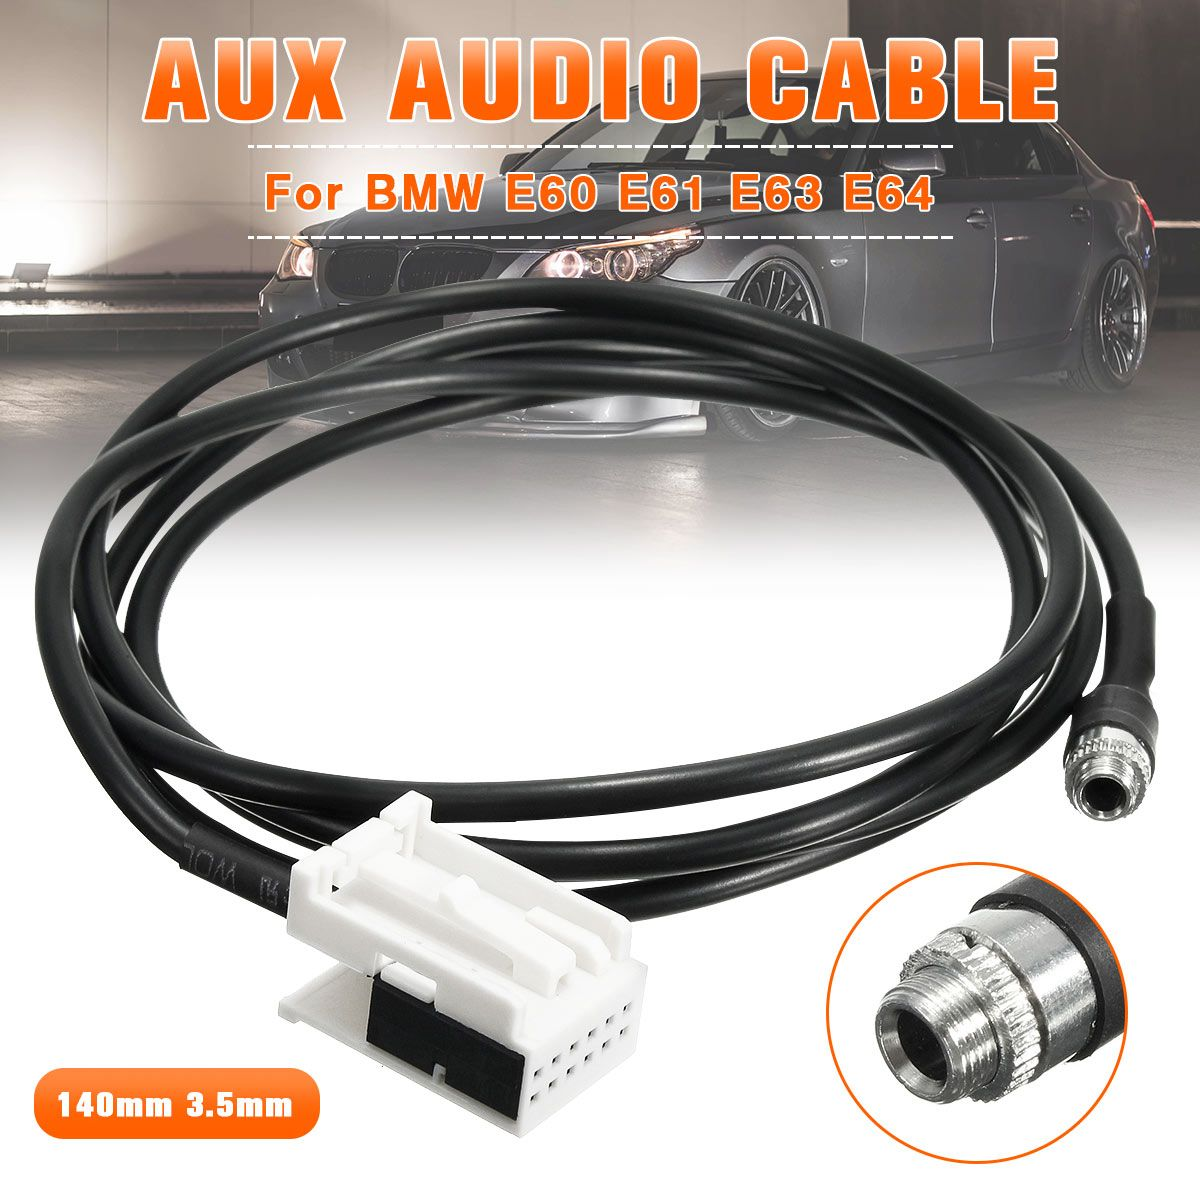 Neue 3,5mm 12PIN Weibliche Schwarz AUX Audio Eingang Kit Adapter Musik Kabel Draht für BMW E60 E61 E63 E64 AUX IN ADAPTER